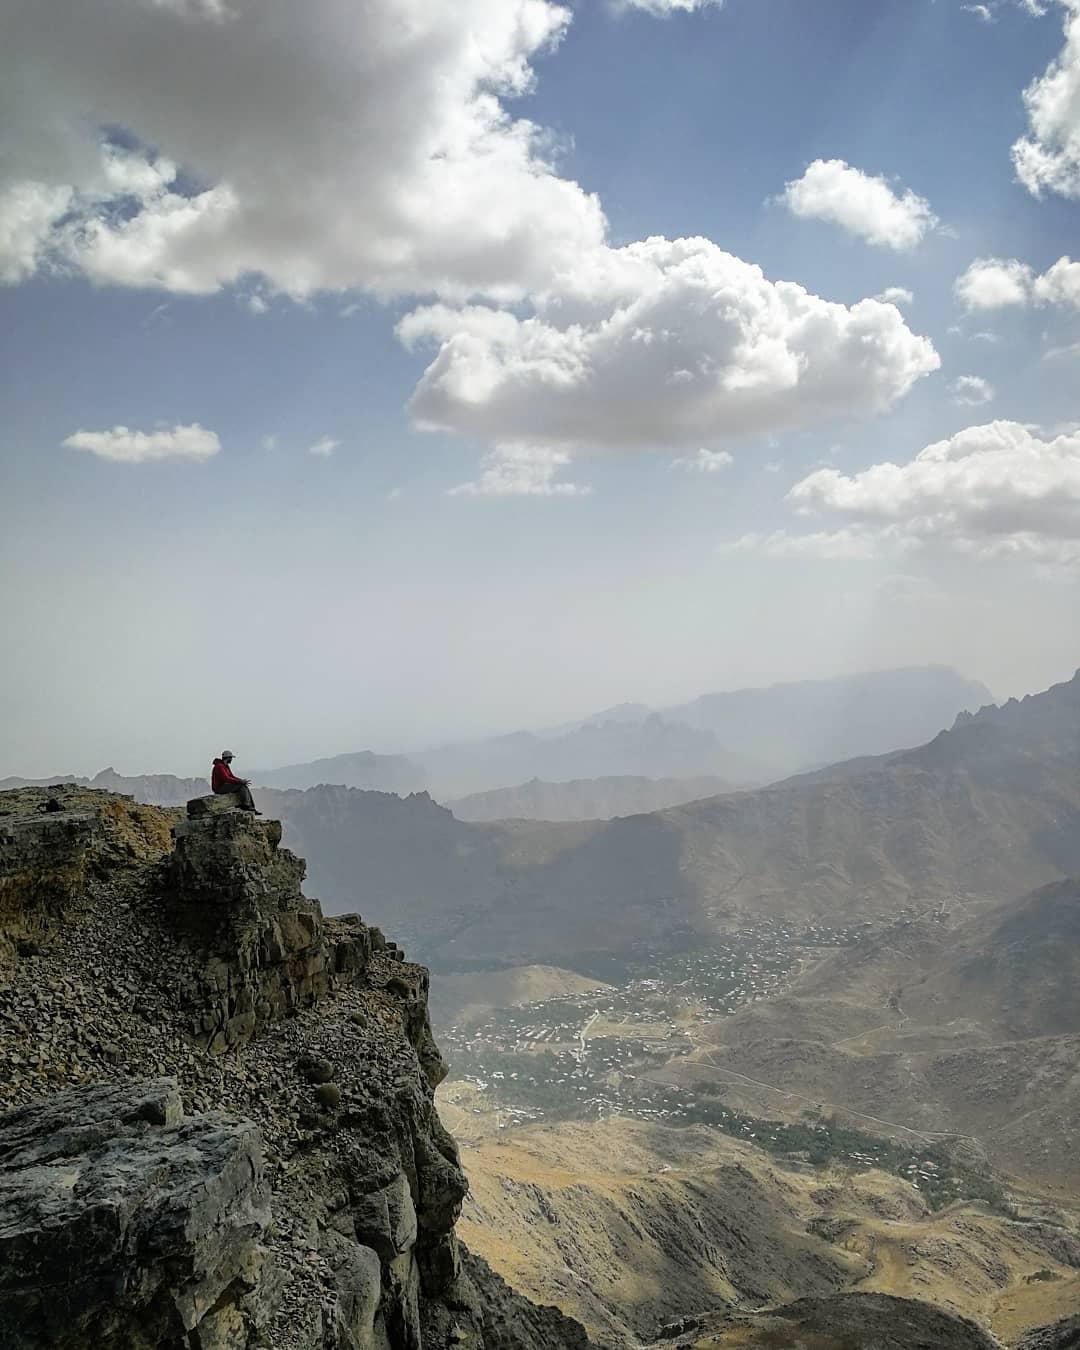 Shirkuh Mountain